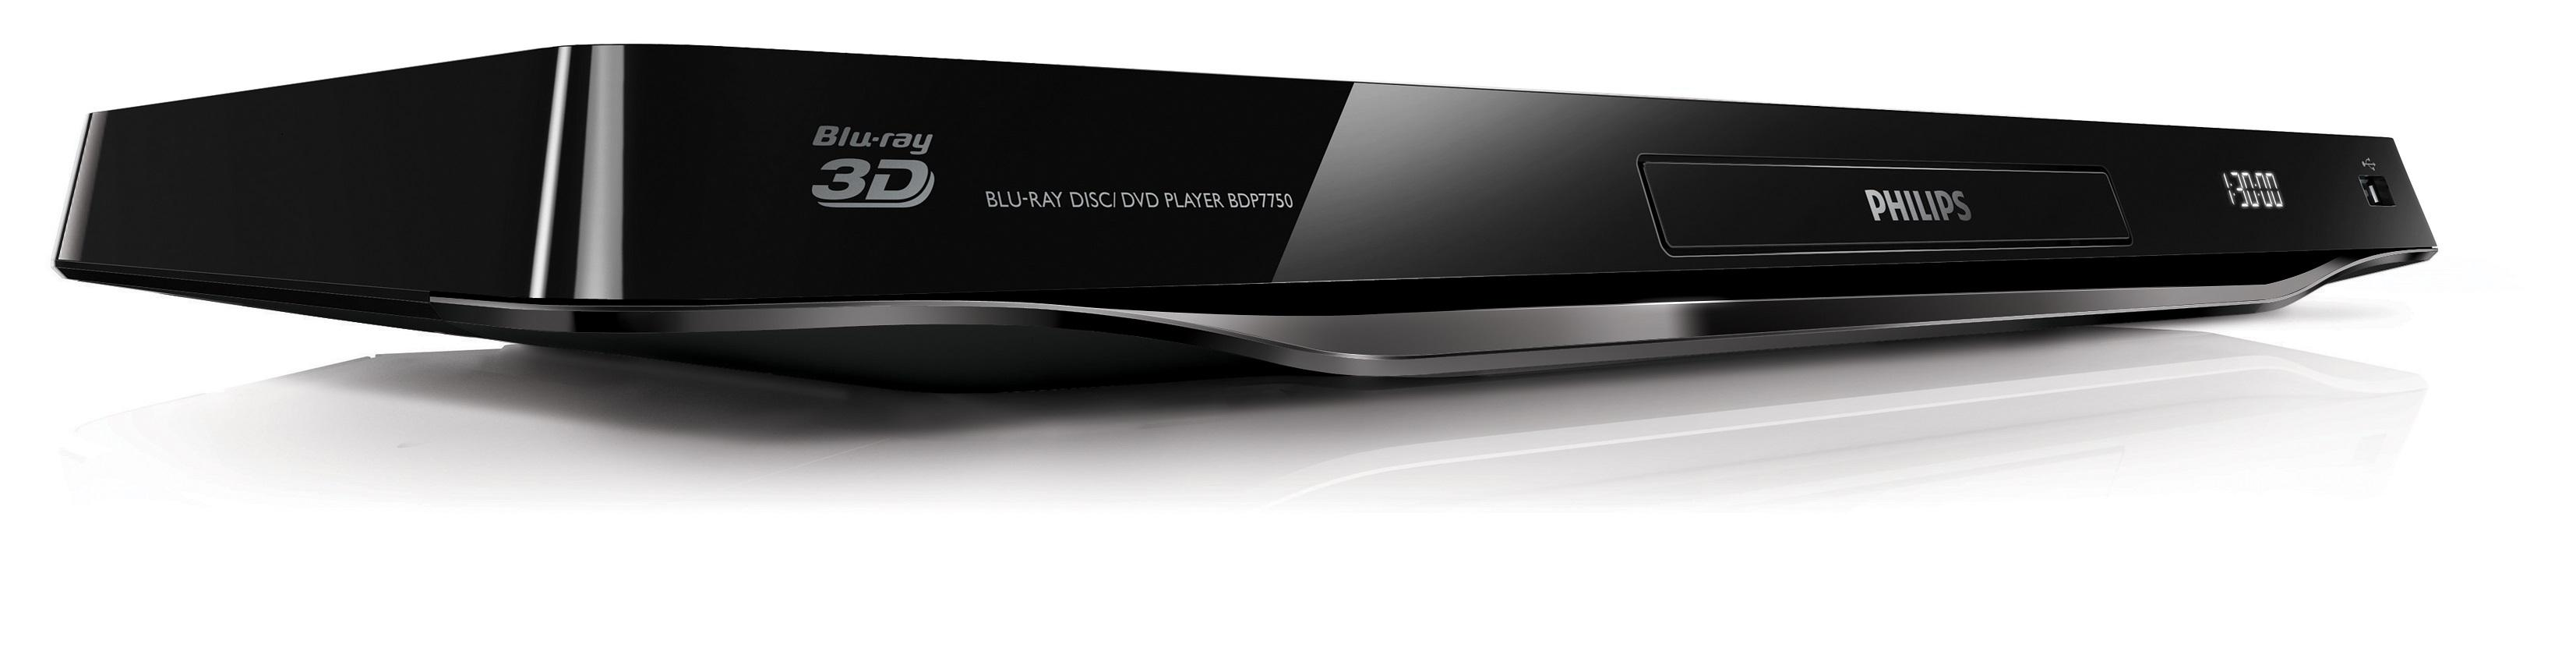 Philips BDP7750/12 - Reproductor de Blu-ray/DVD (4K Ultra